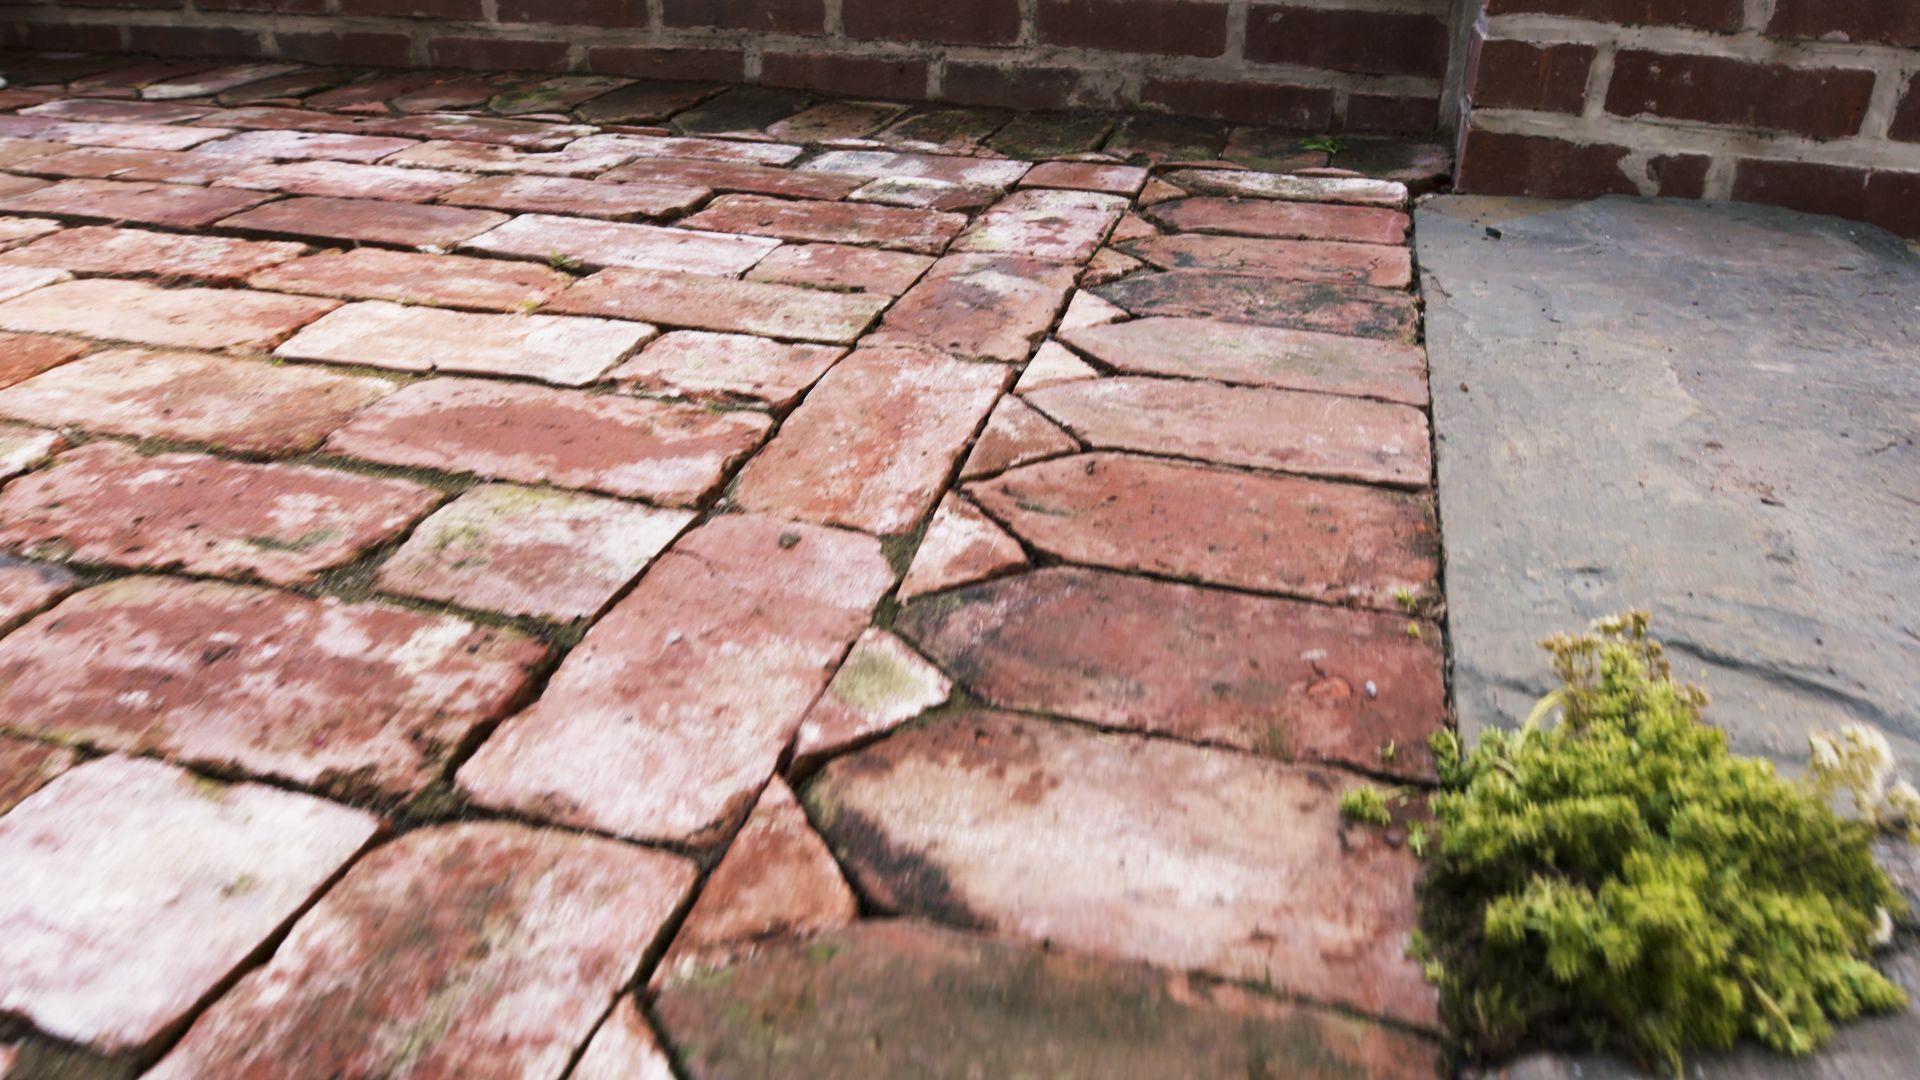 Best Walkway Materials Cobblestone Vs Brick Vs Pavers Vs Gravel